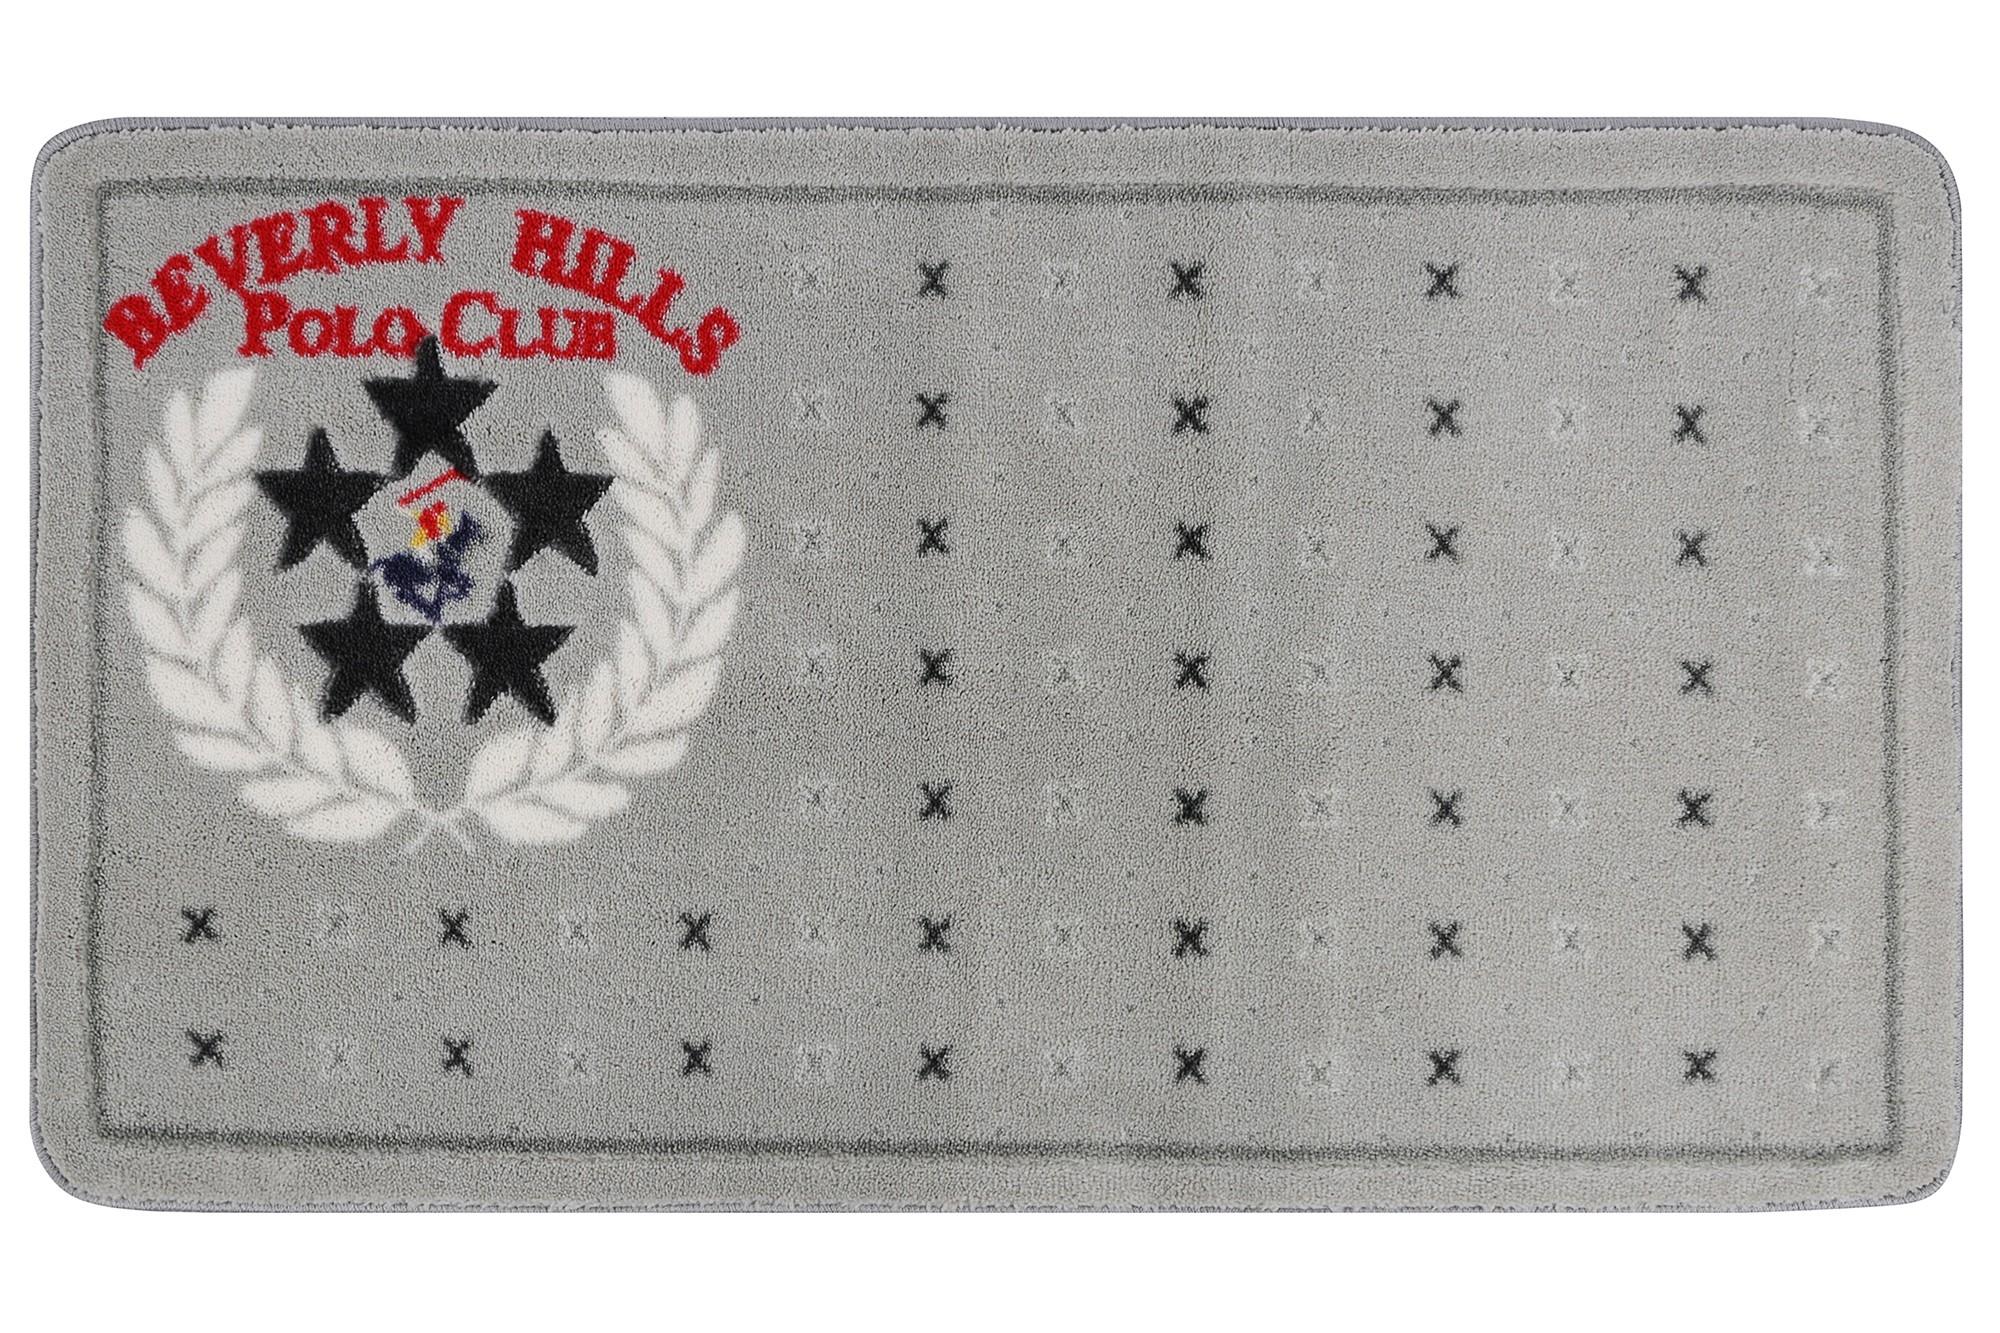 Covoras pentru baie Beverly Hills Polo Club 317 Gri, 67 x 120 cm